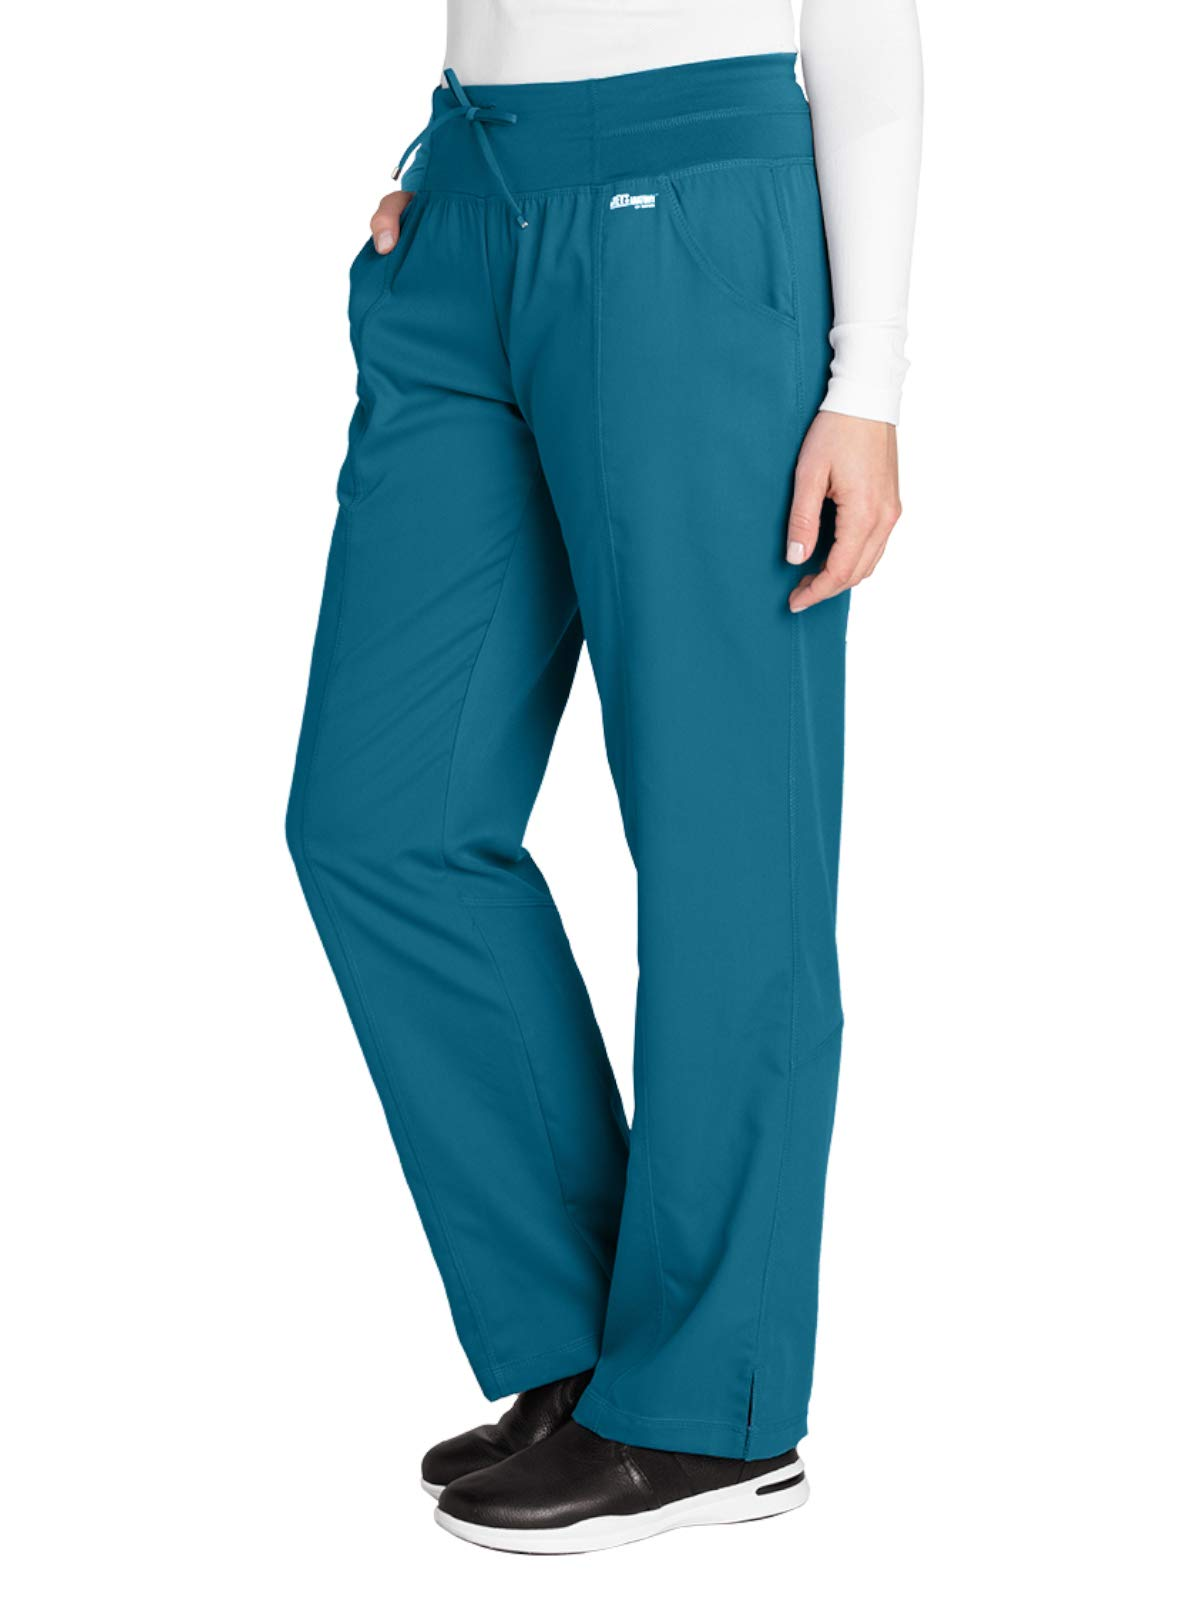 Grey's Anatomy Active 4276 Yoga Pant Bahama 2XL Petite